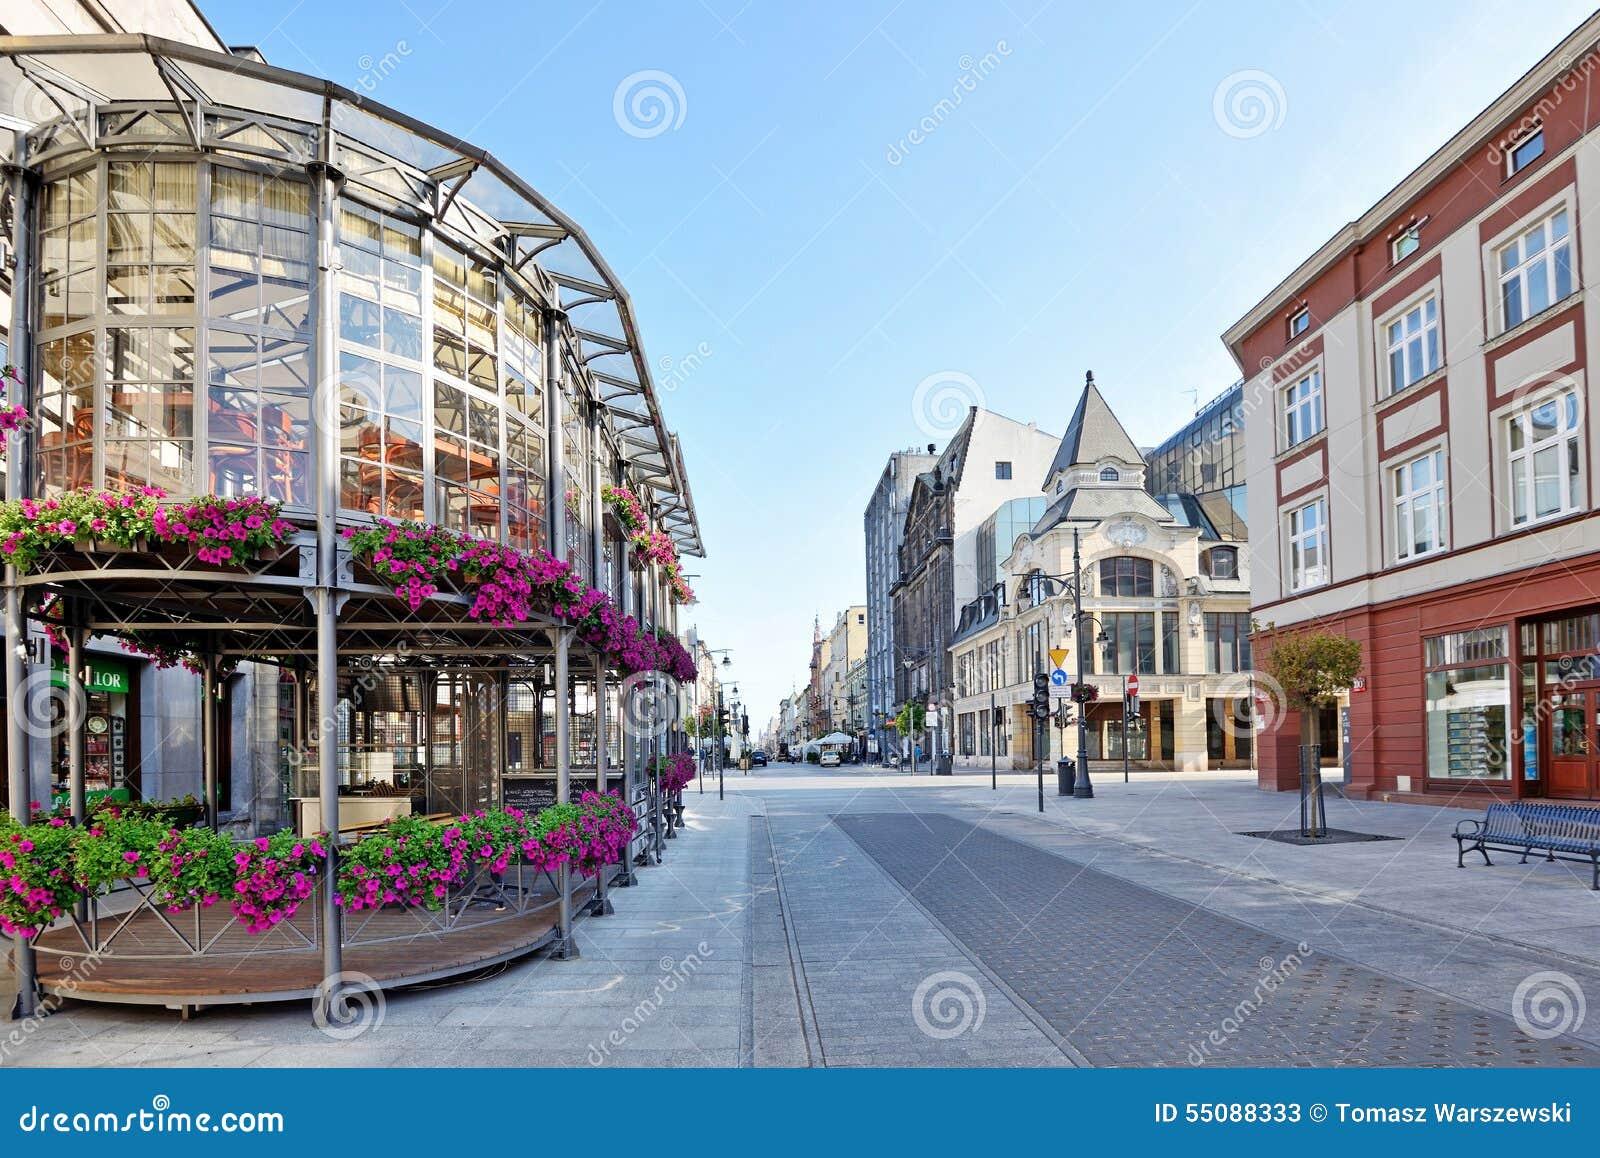 Piotrkowska Street Lodz Poland Stock Image Image 55088333